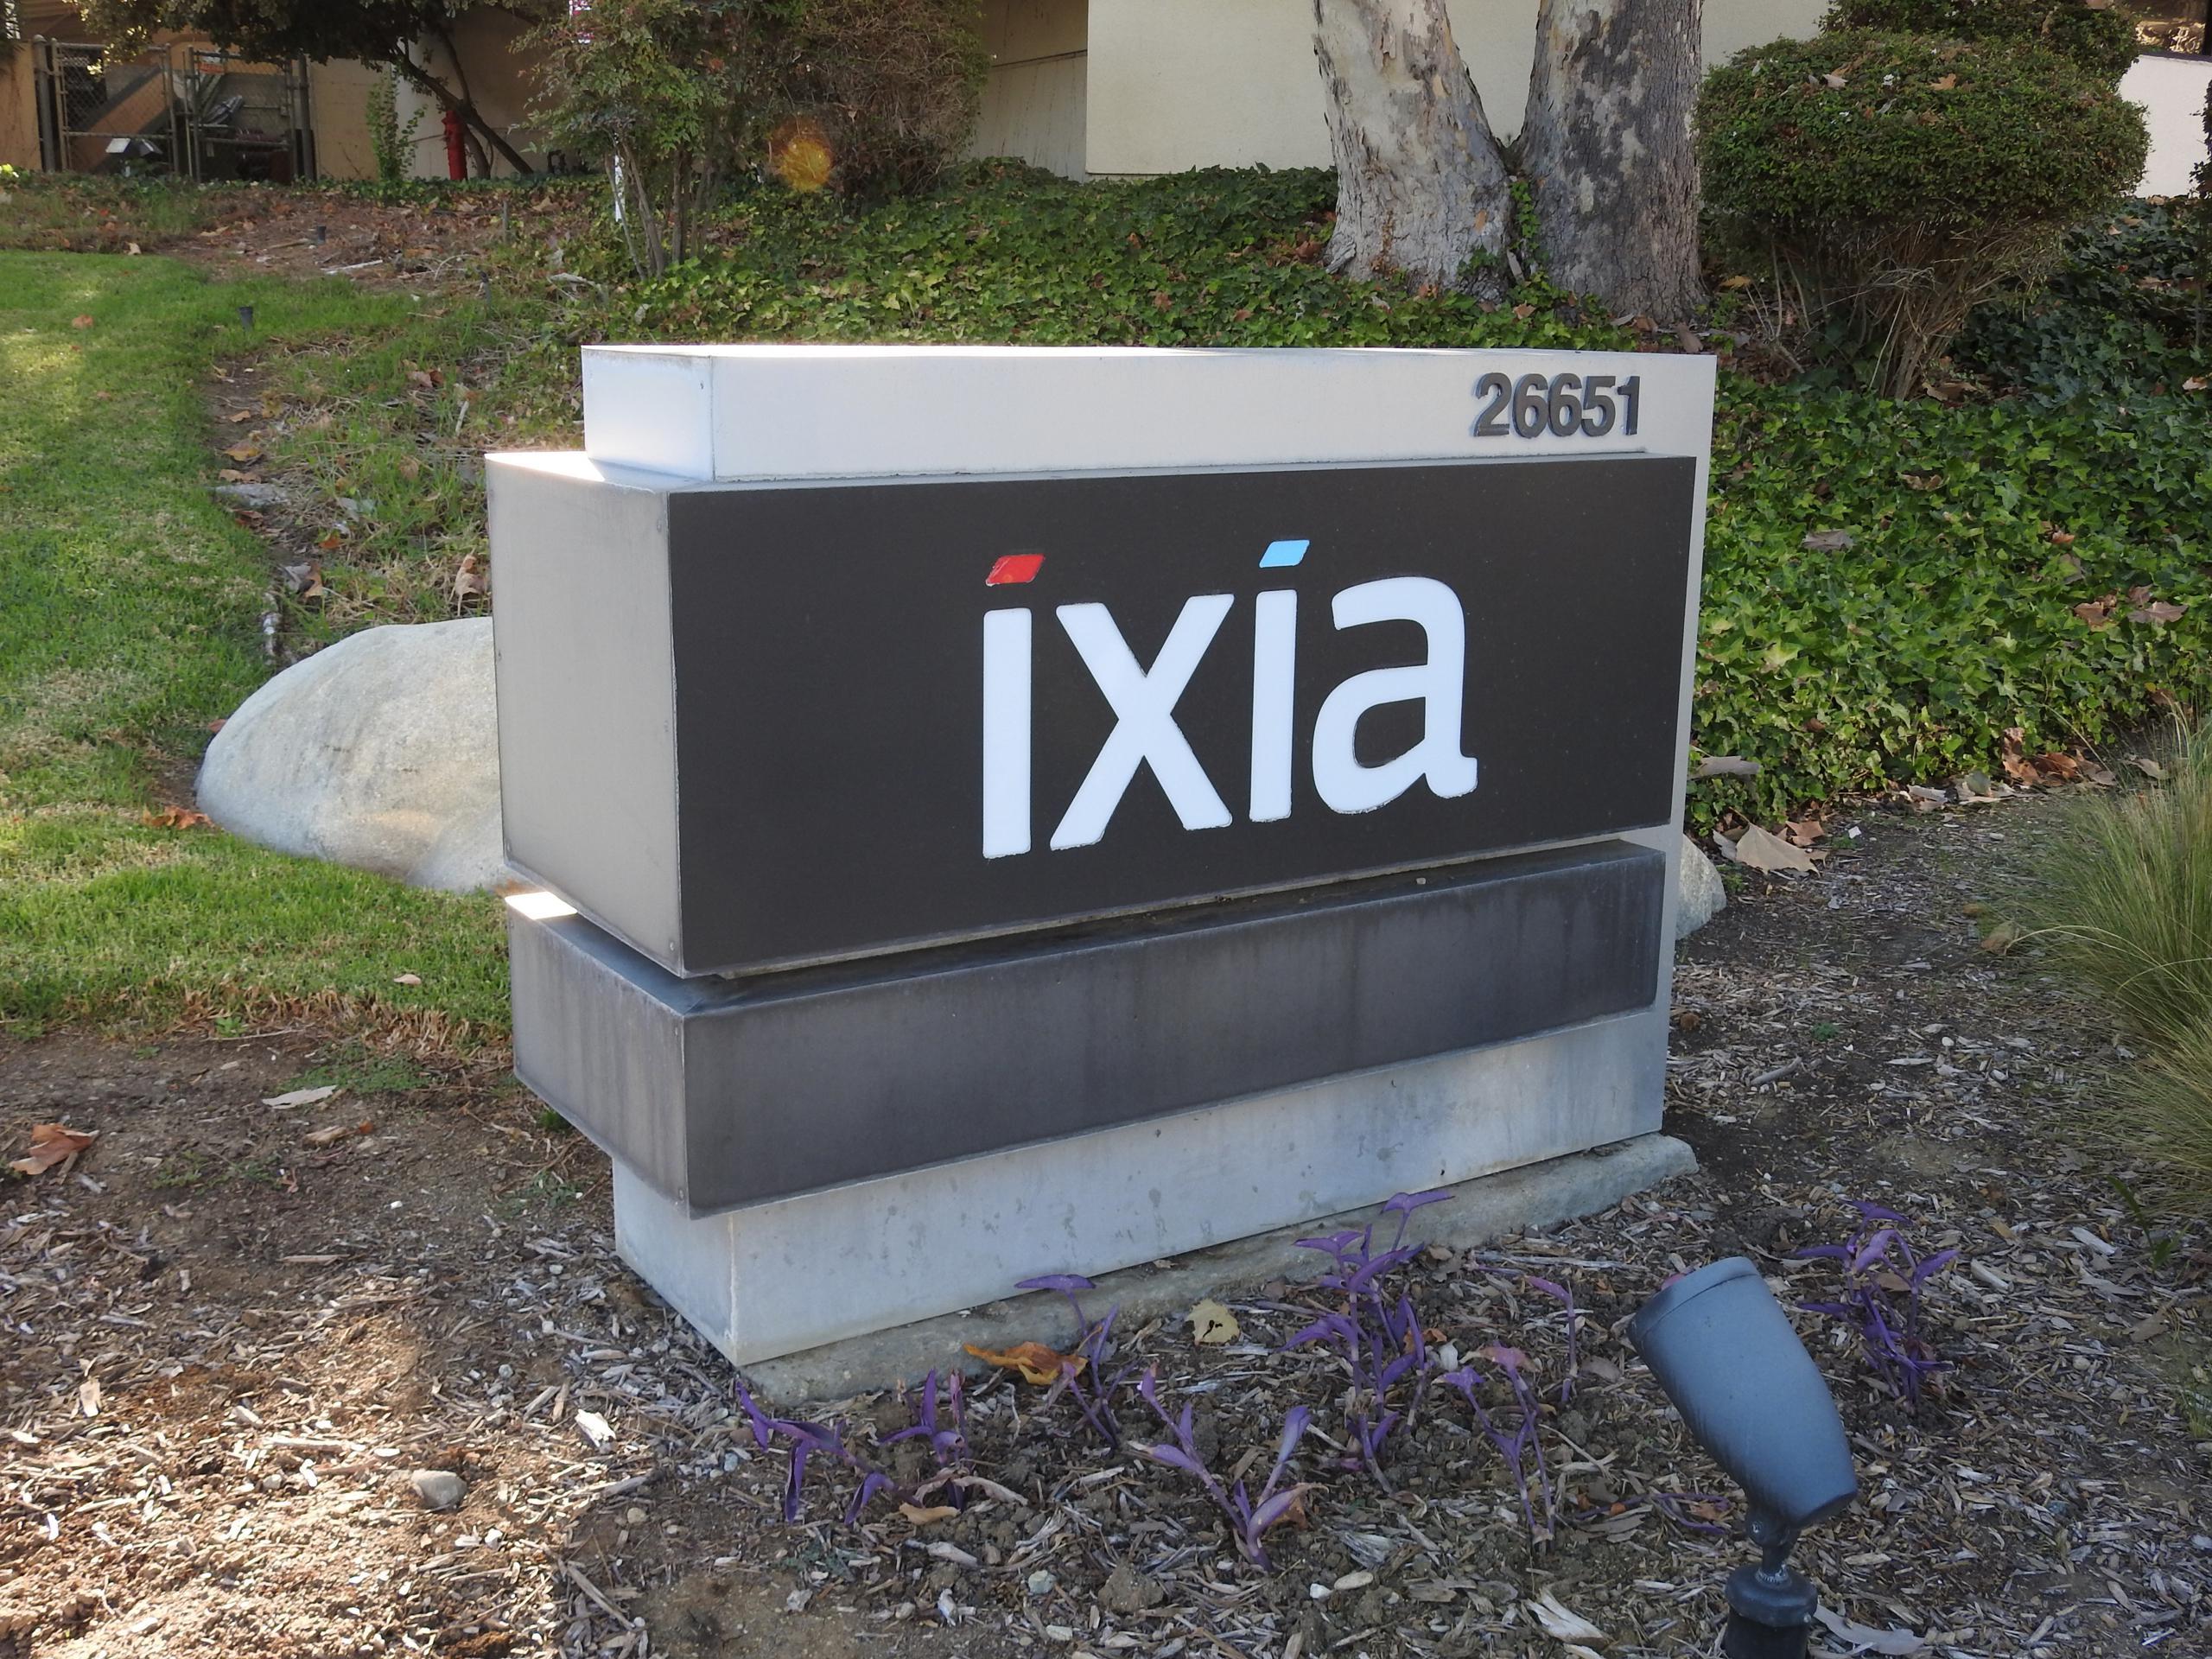 Keysight Technologies Acquires Ixia | Mergr